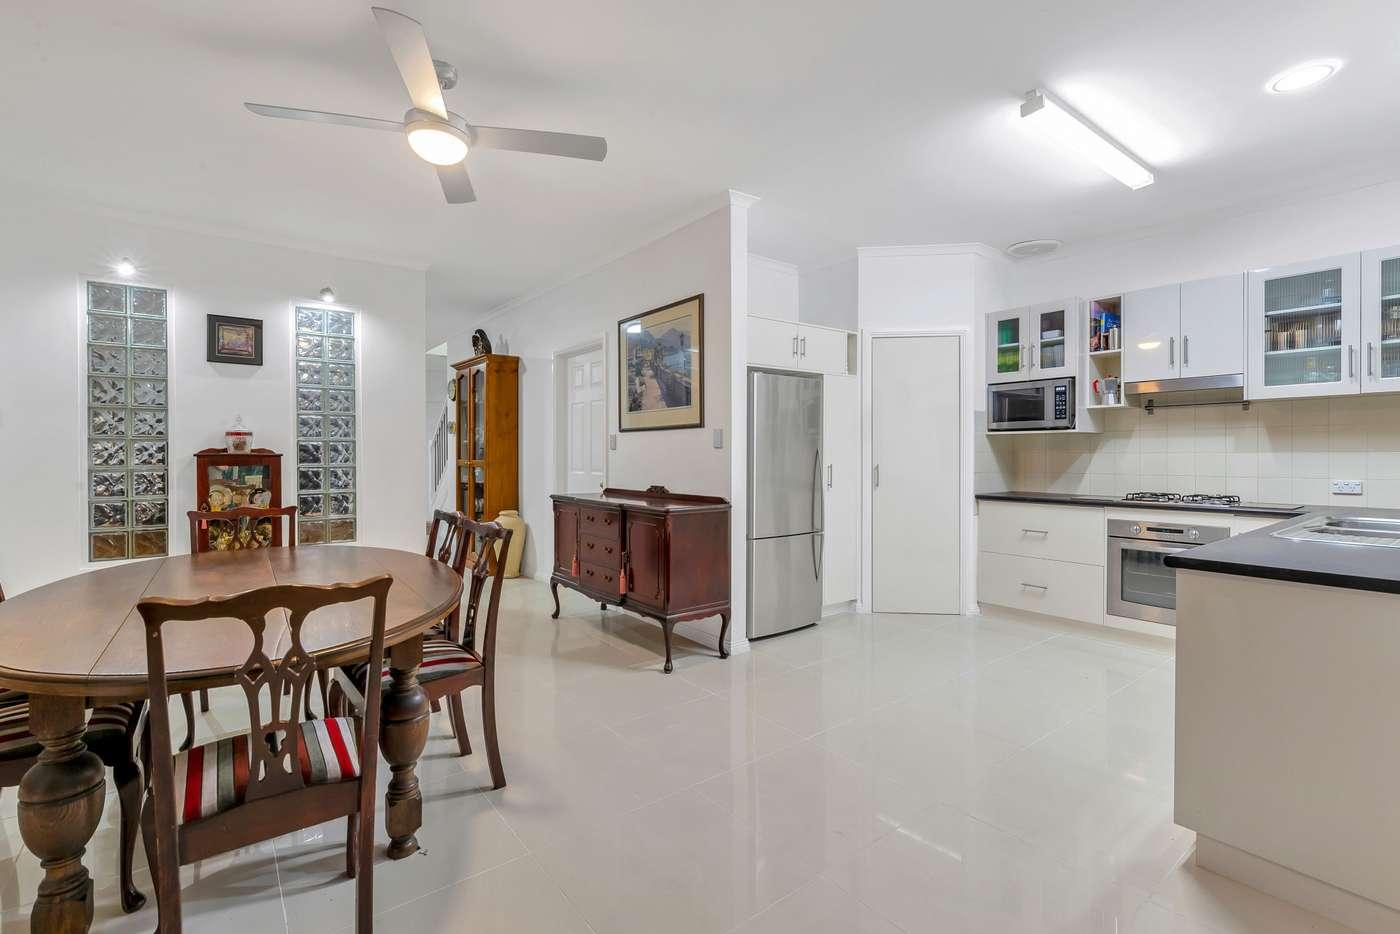 Sixth view of Homely house listing, 4 John Ridley Place, Ridleyton SA 5008